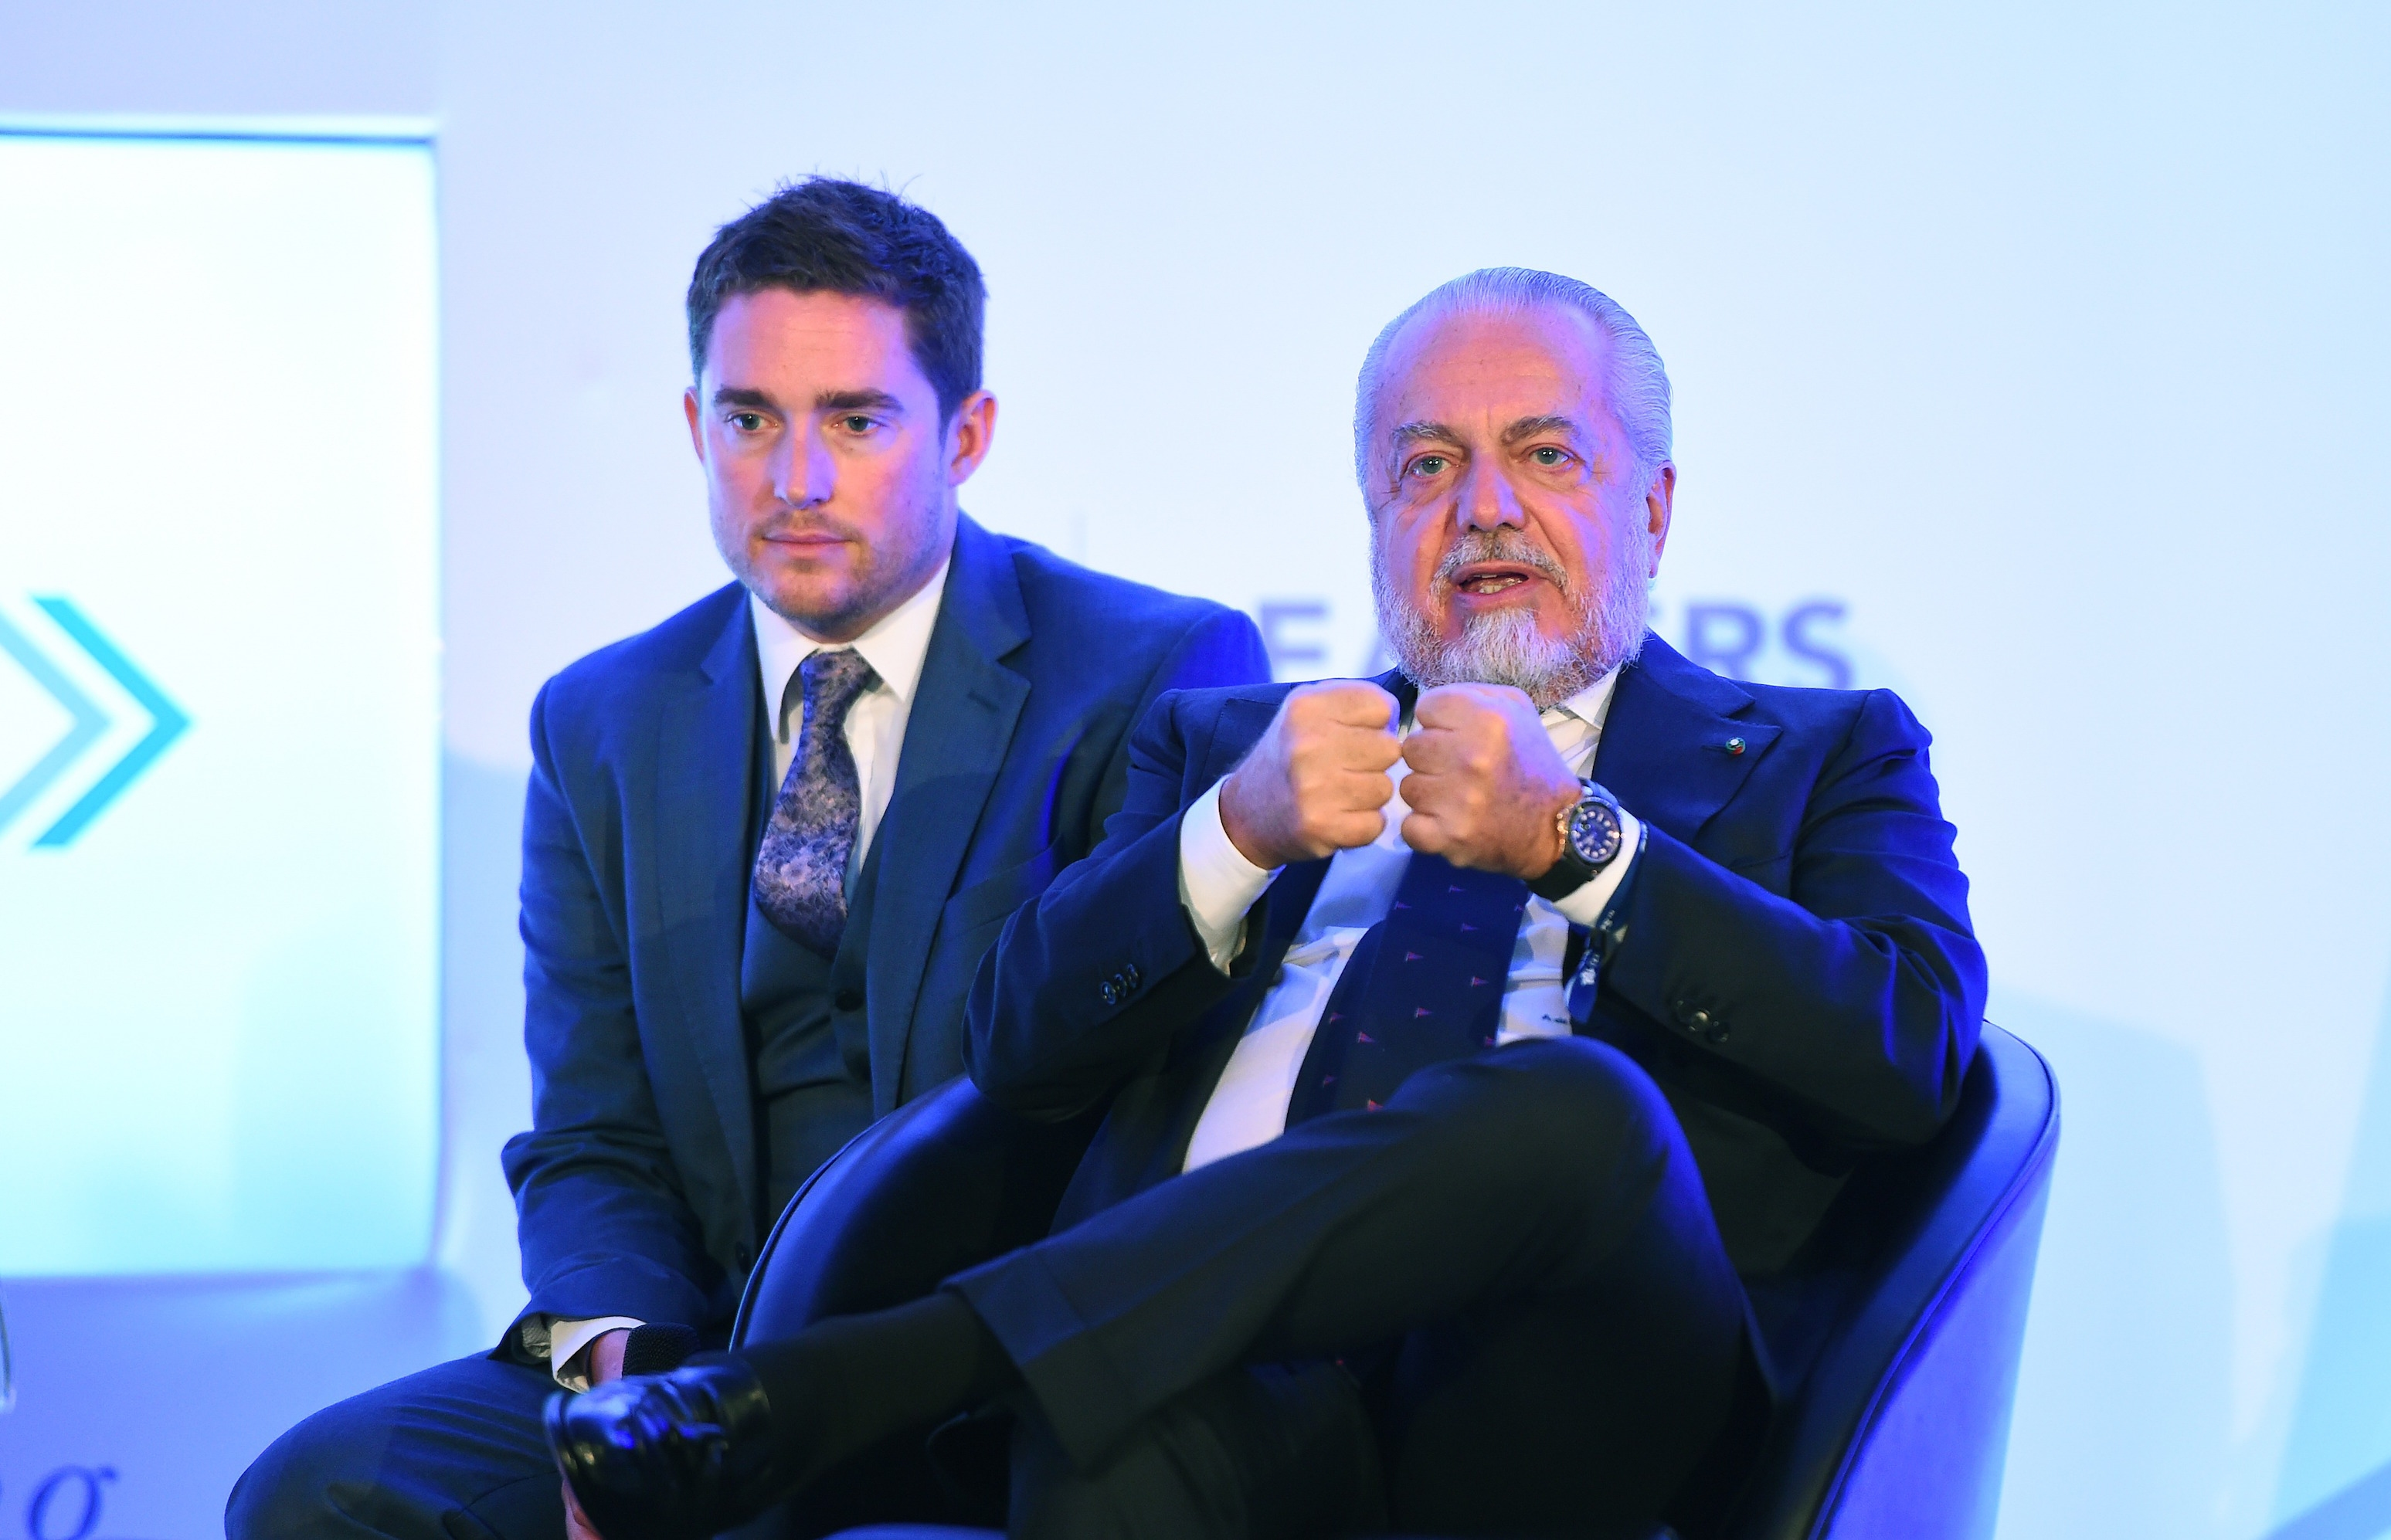 Президентът на Наполи Аурелио Де Лаурентис призна, че приоритетна цел